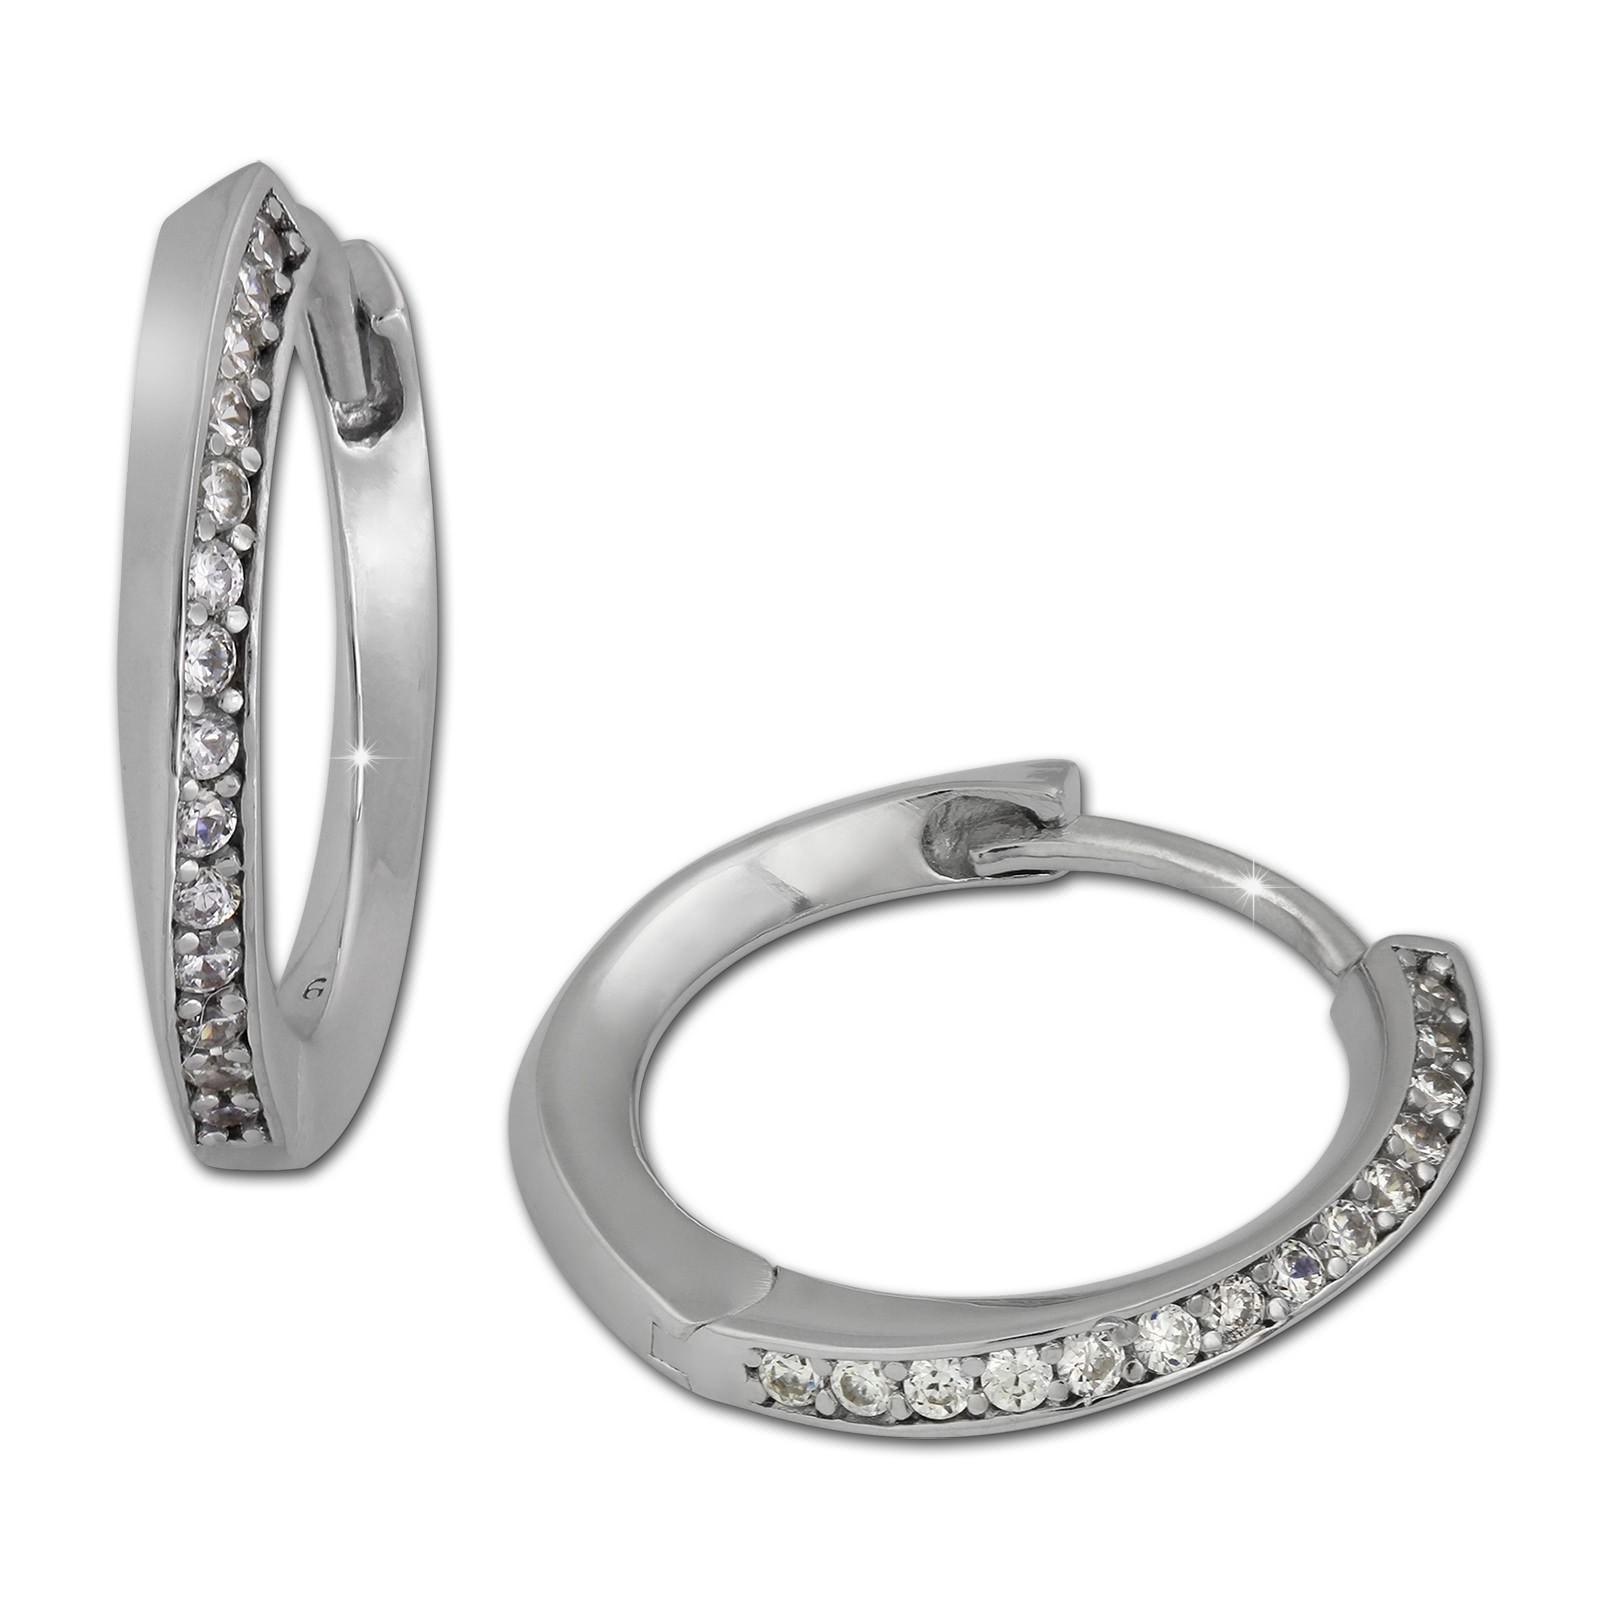 SilberDream Creole Zirkonia weiß 925 Sterling Silber Ohrring SDO350W